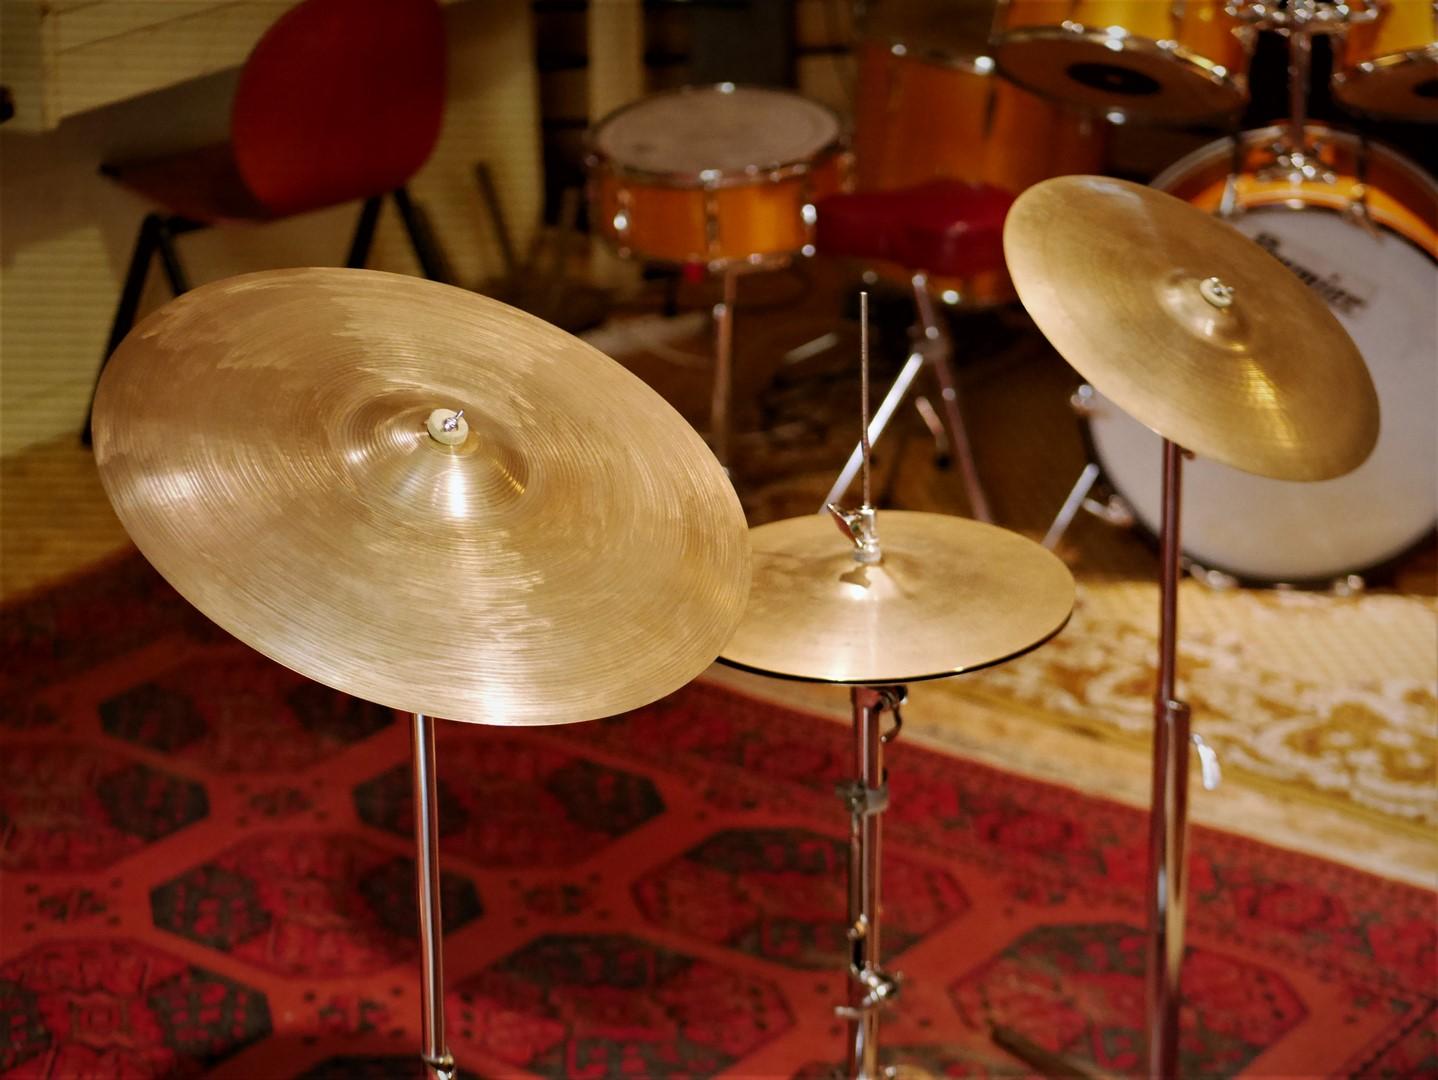 studio-la-boite-a-meuh-set-zildjian-avedis-vintage